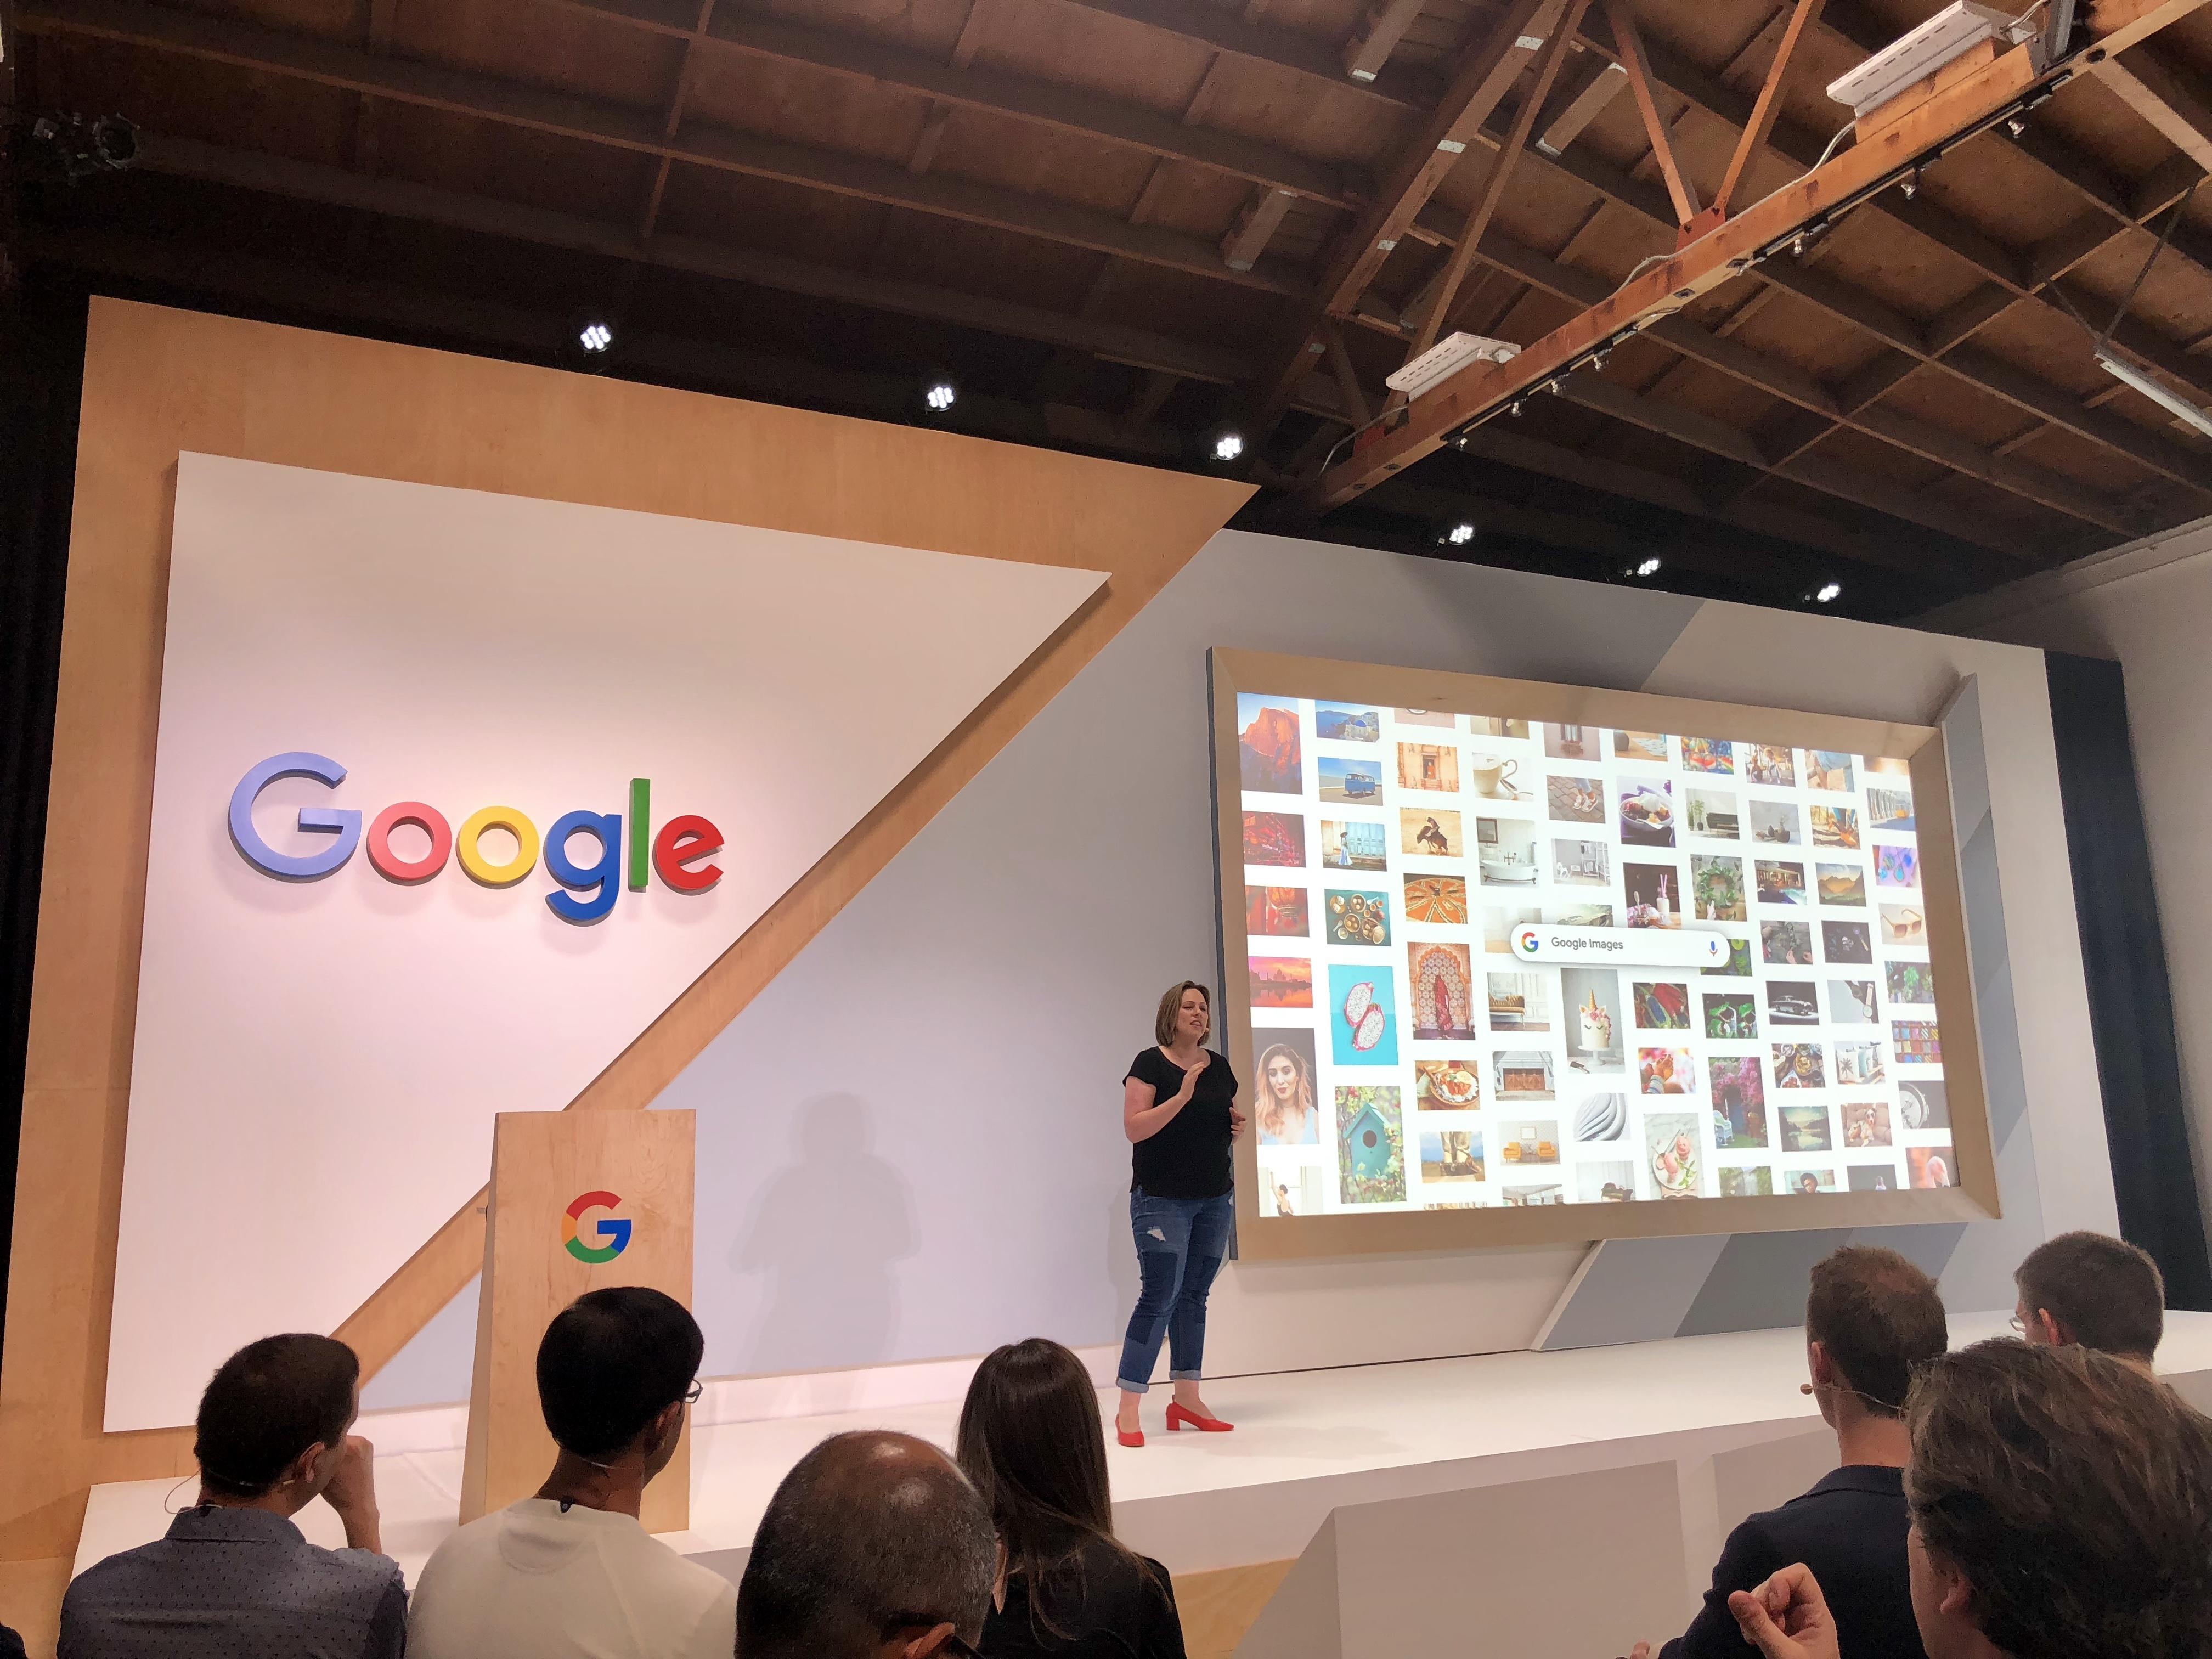 Google exec Cathy Edwards onstage